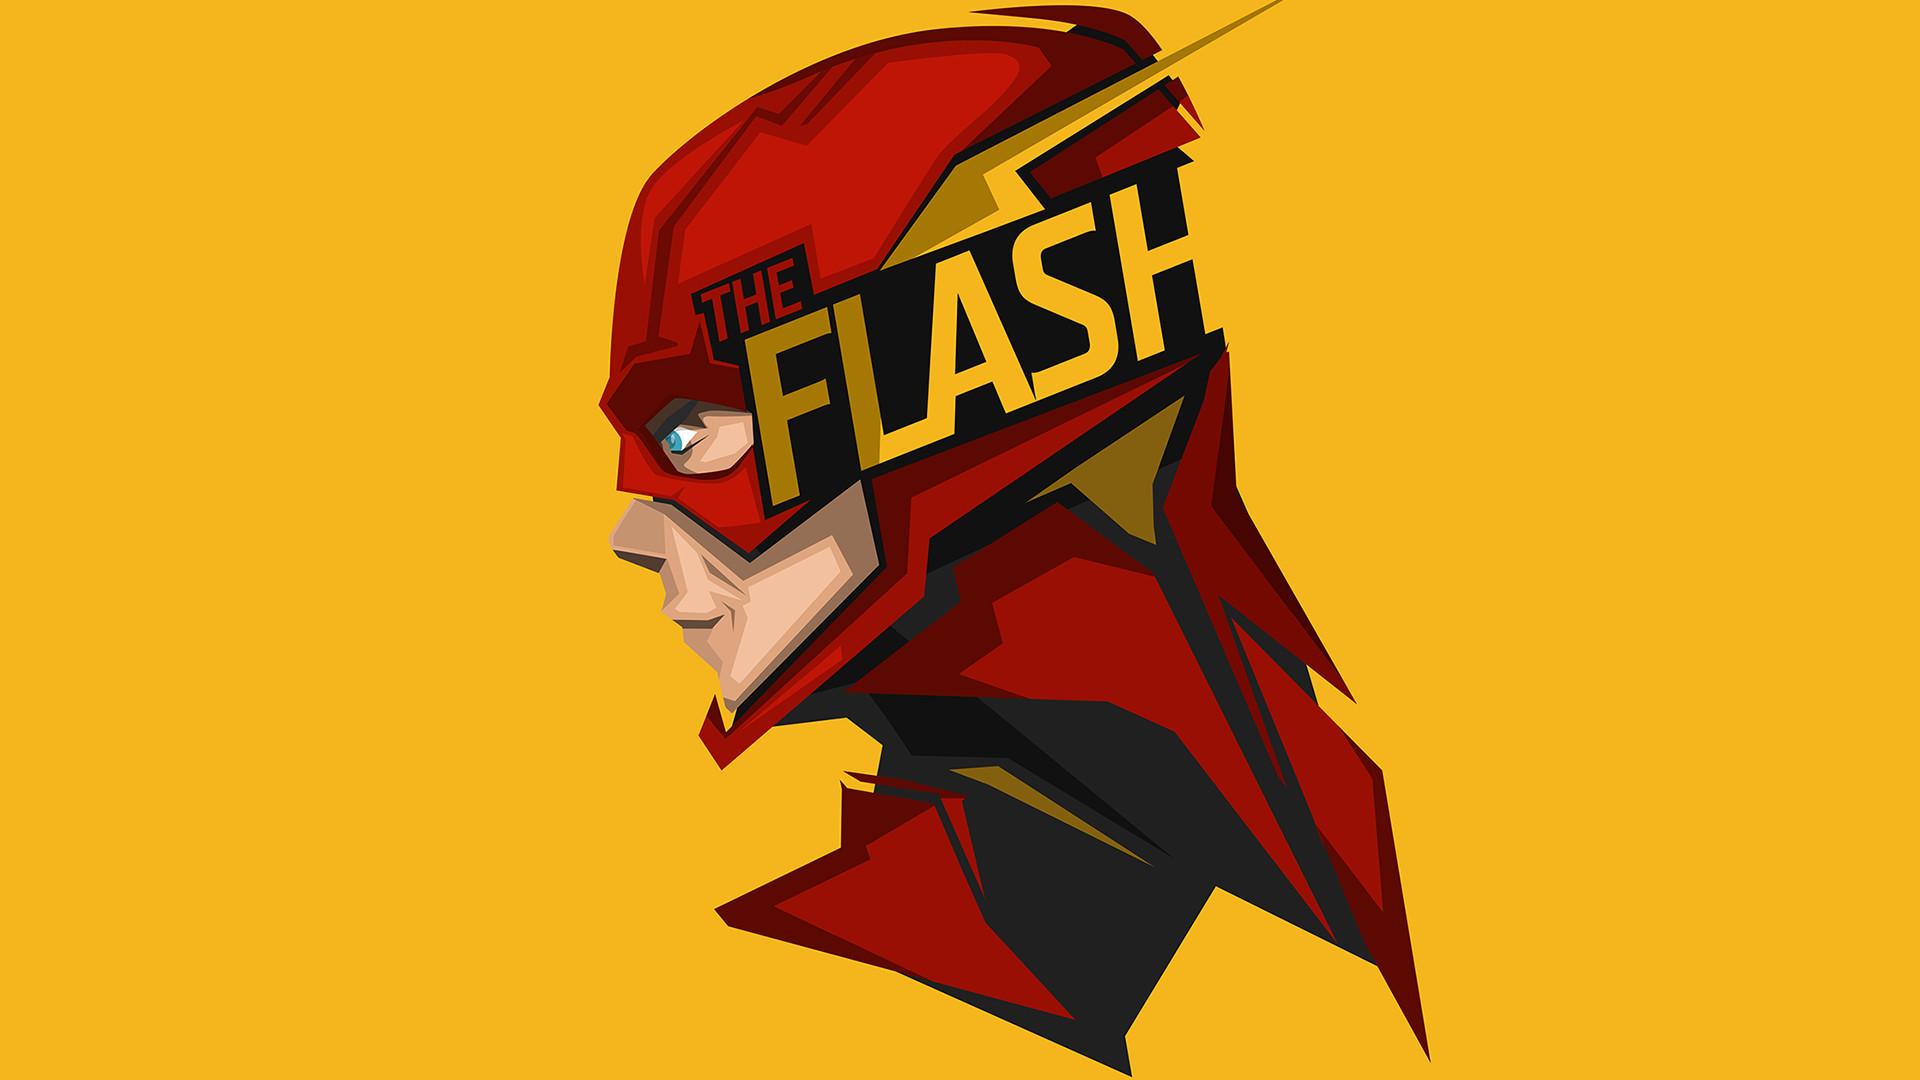 The flash new 52 wallpaper 70 images - Flash wallpaper hd 1080p ...